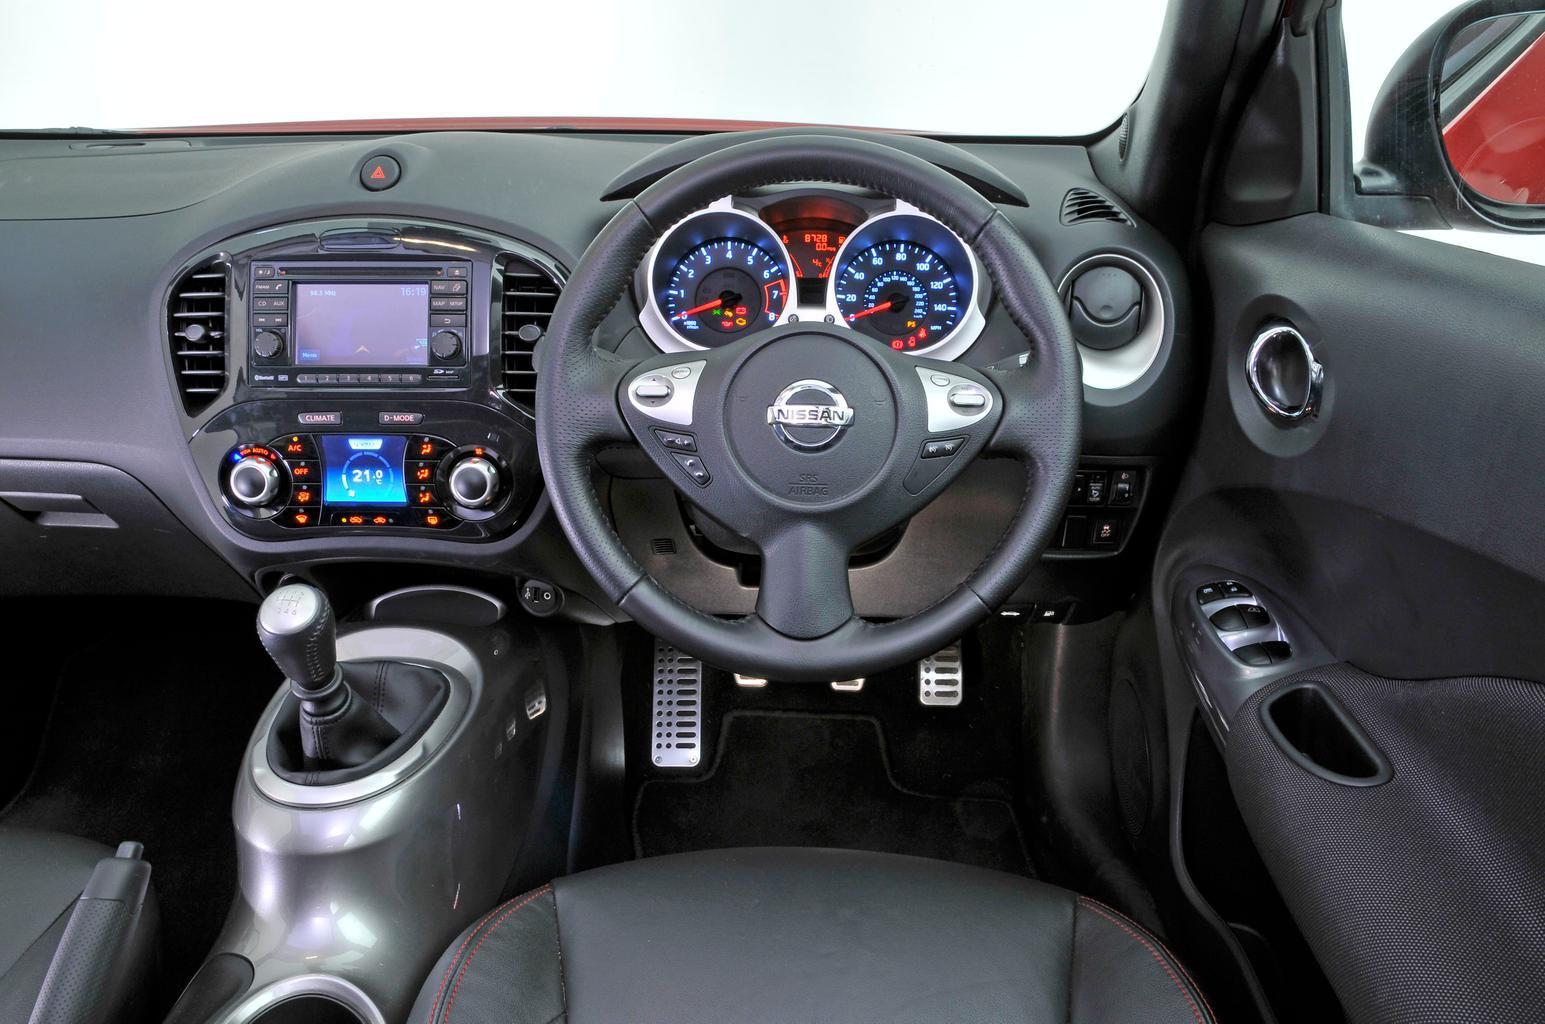 Used test – high fashion: Mini Cooper S vs Nissan Juke vs Volkswagen Beetle